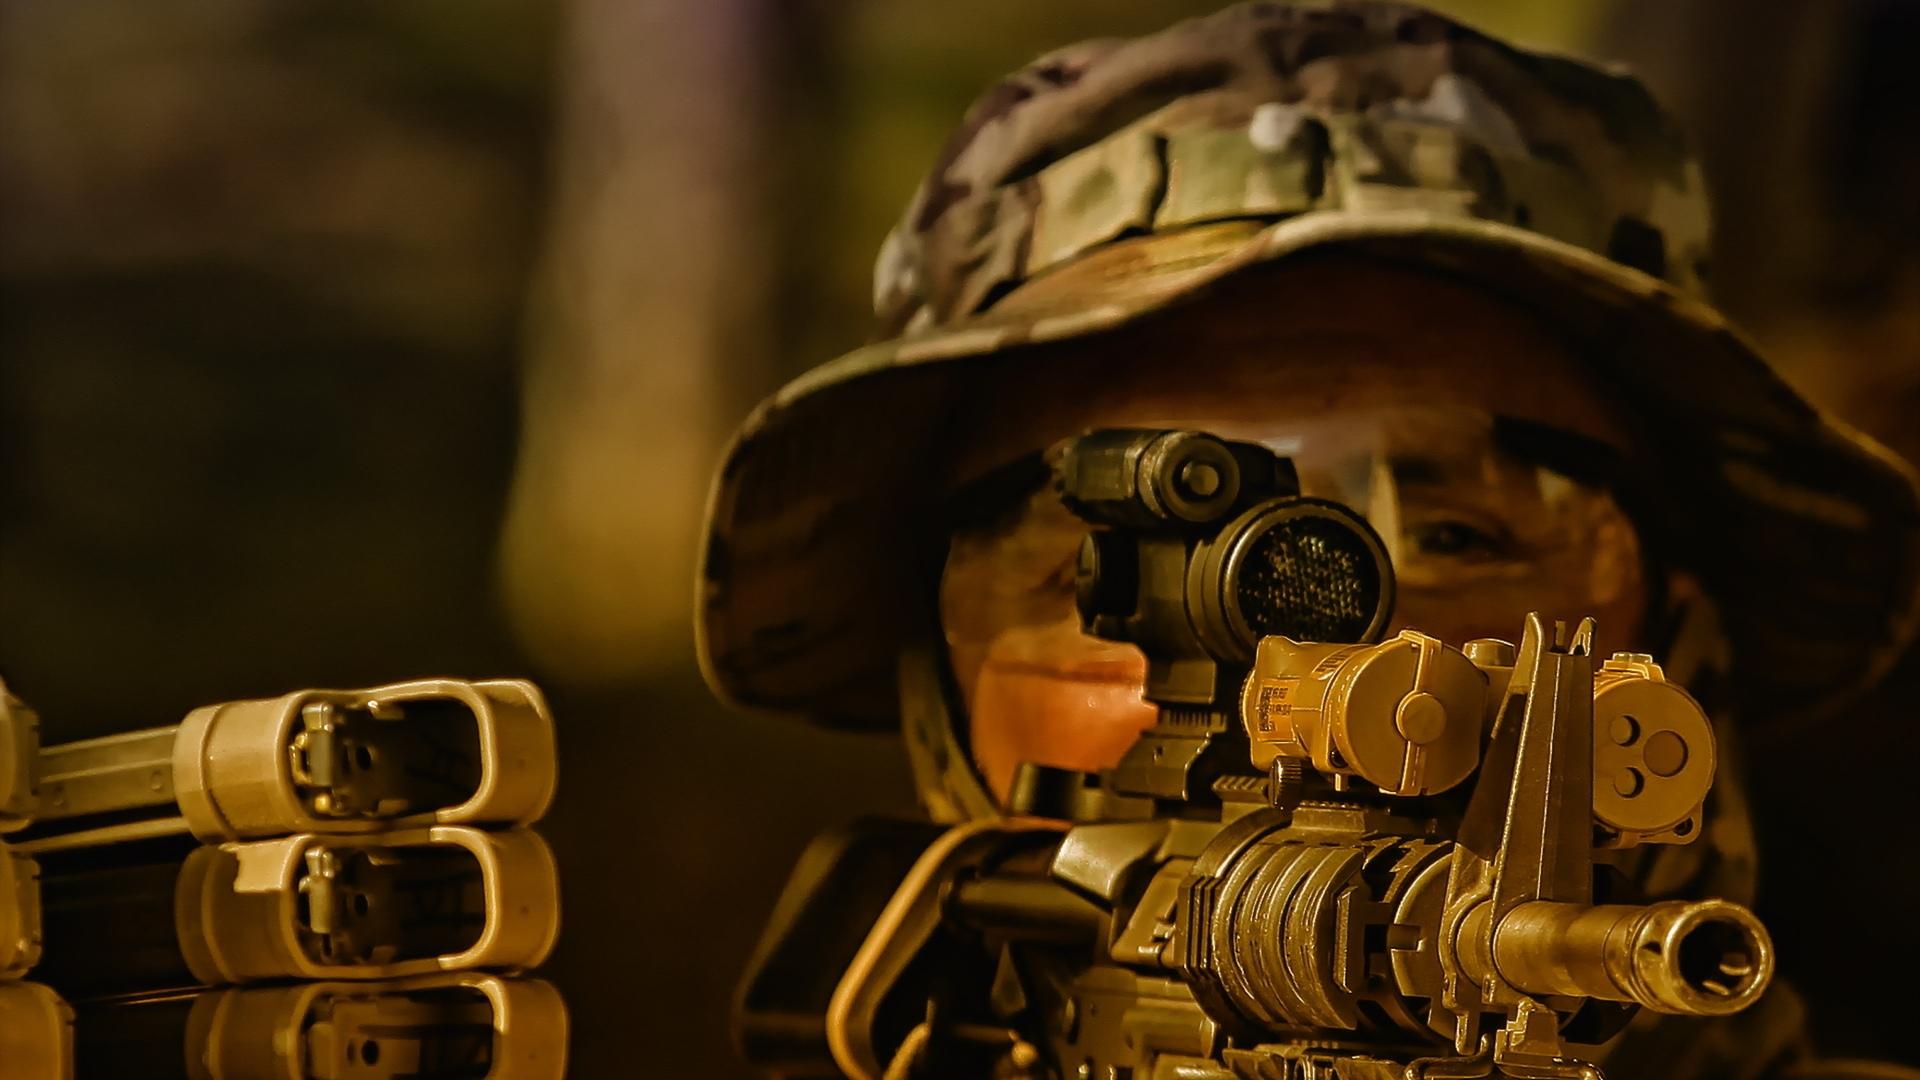 солдат, винтовка, прицел